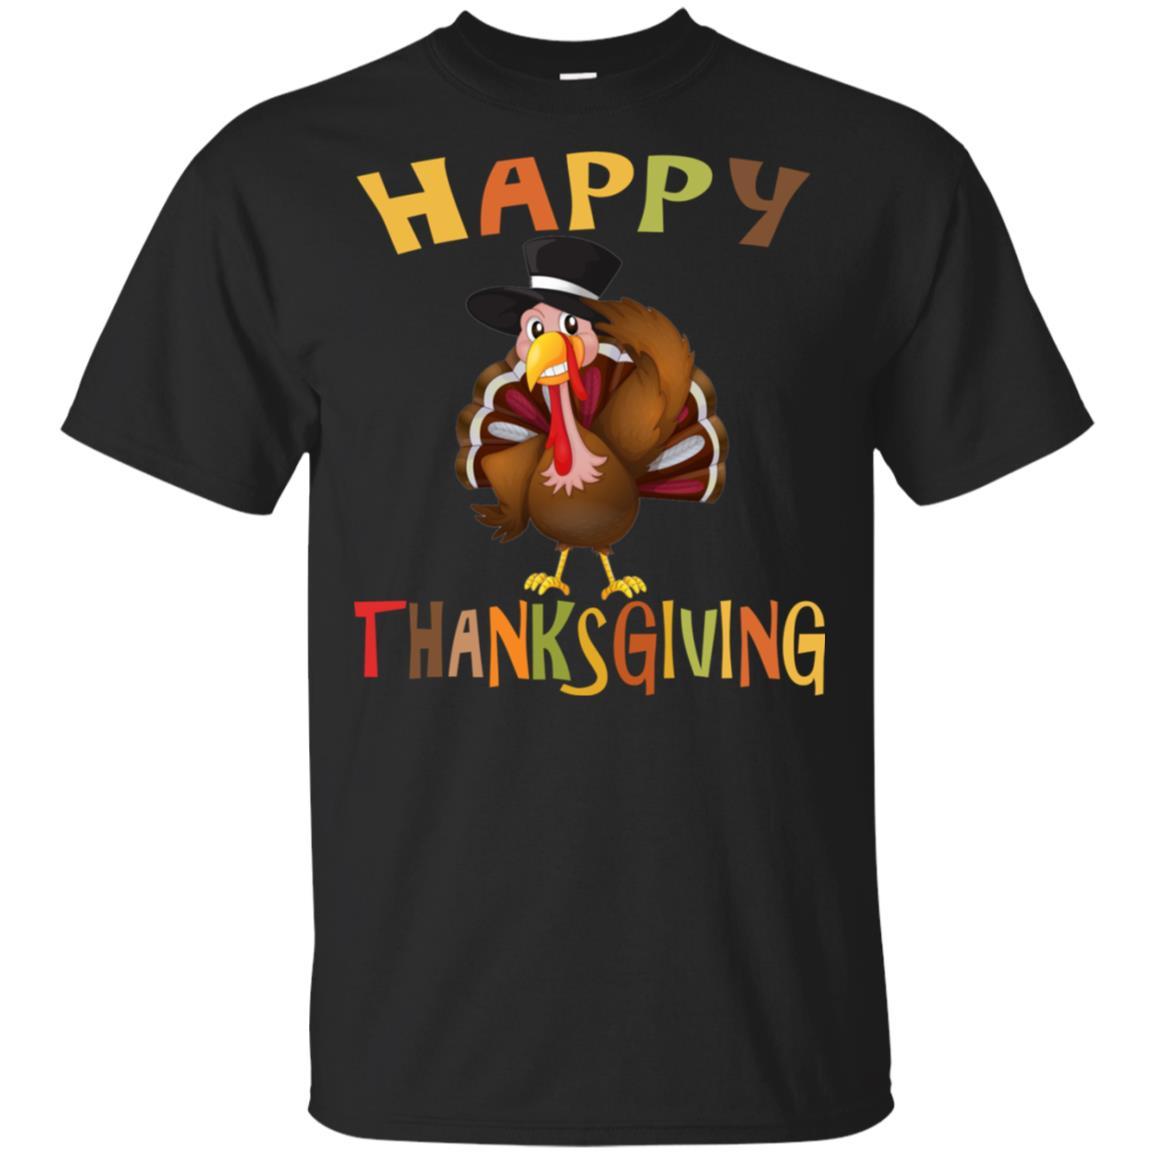 Happy Thanksgiving Tee shirt Unisex Short Sleeve